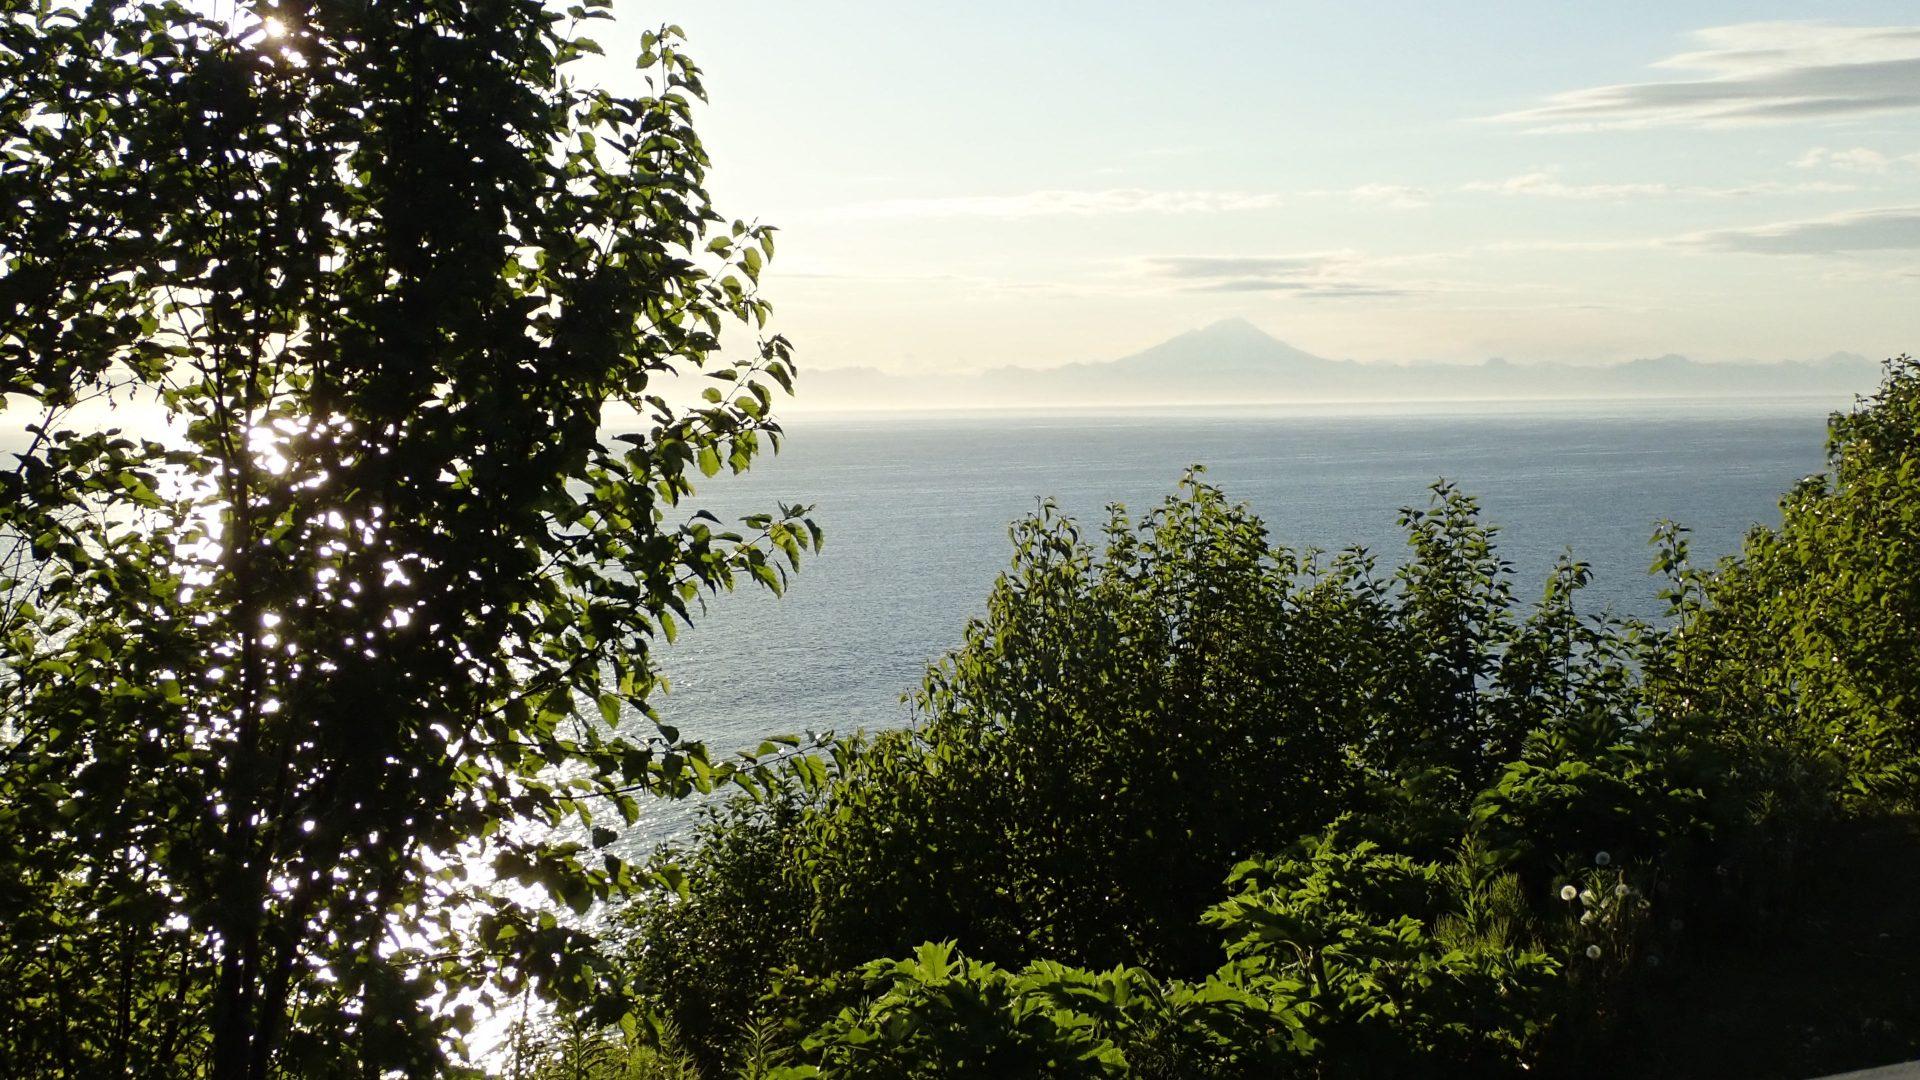 View over Cook Inlet, Alaska